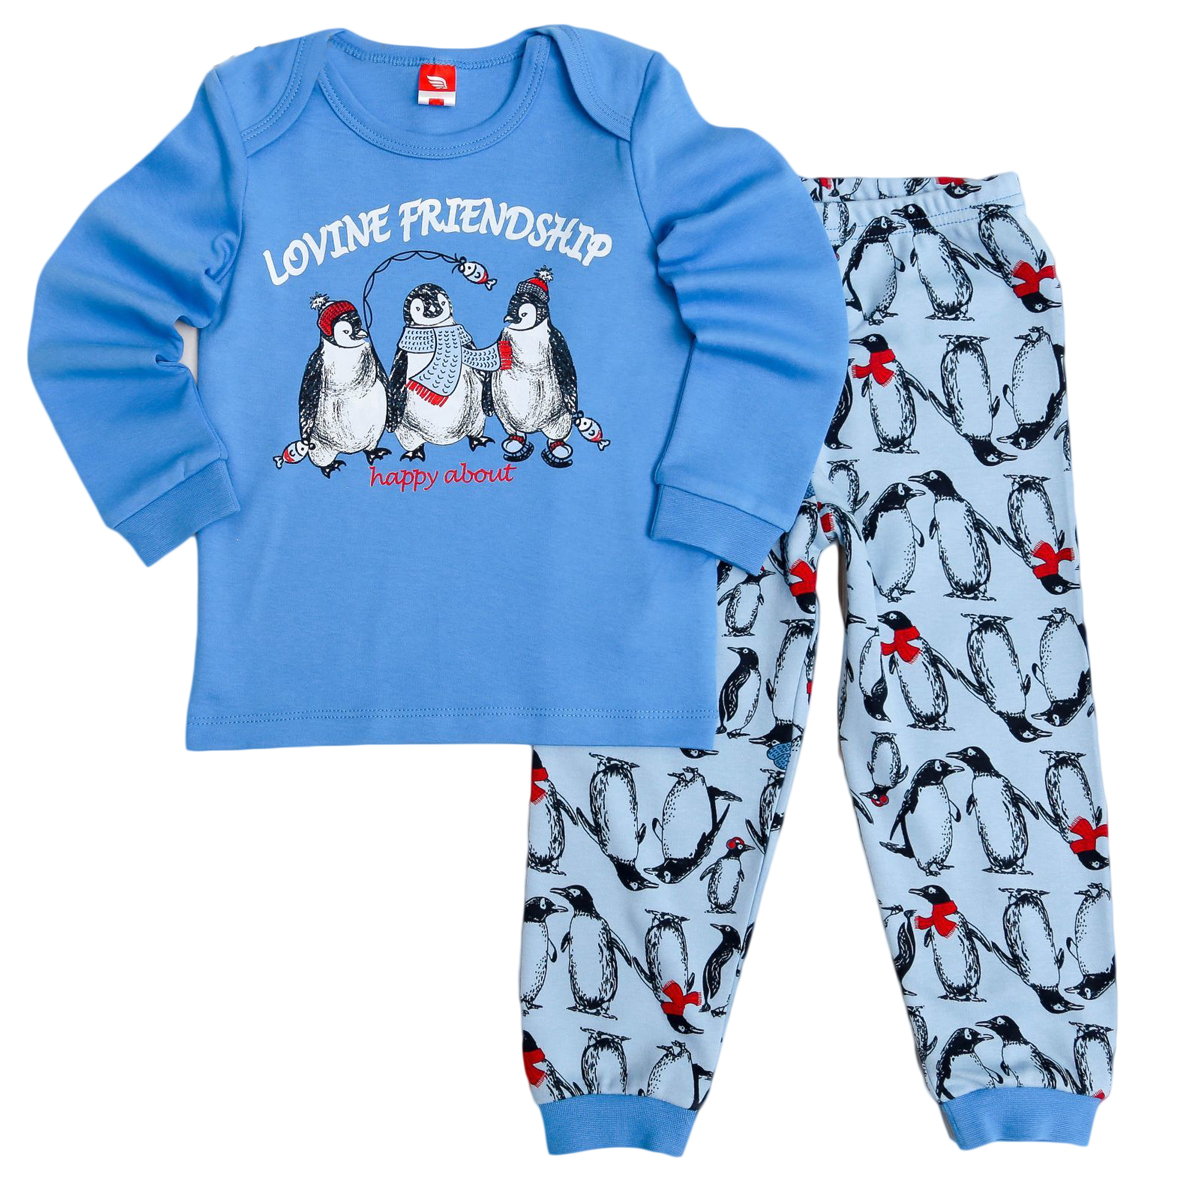 Пижама для мальчика Cherubino, цвет: голубой. CAB 5286. Размер 92